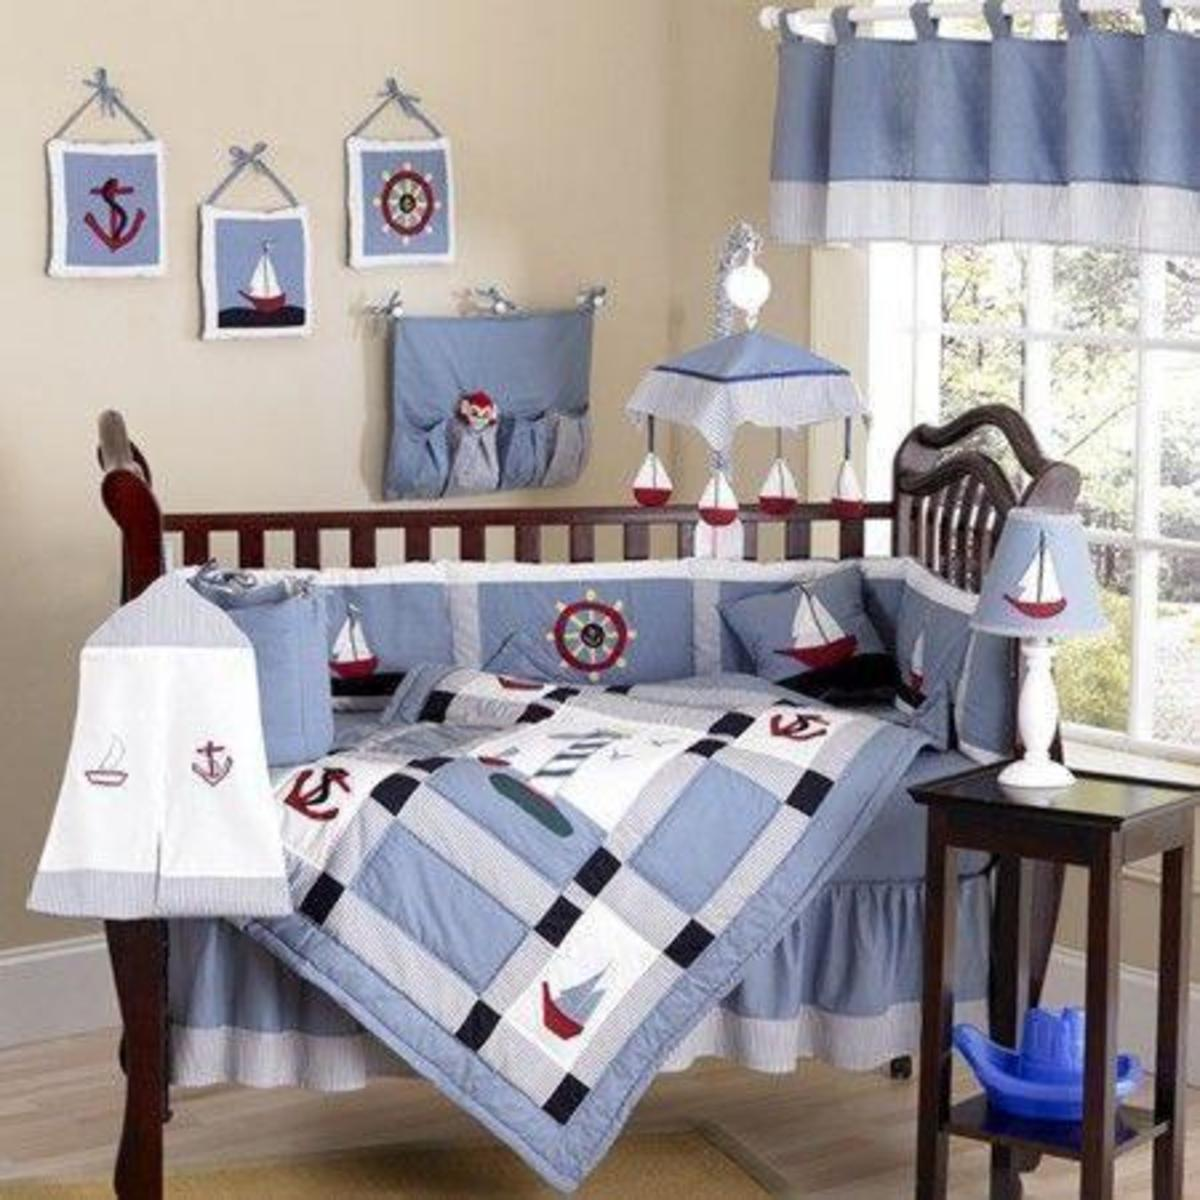 Baby Crib Bedding Set in Nautical Theme